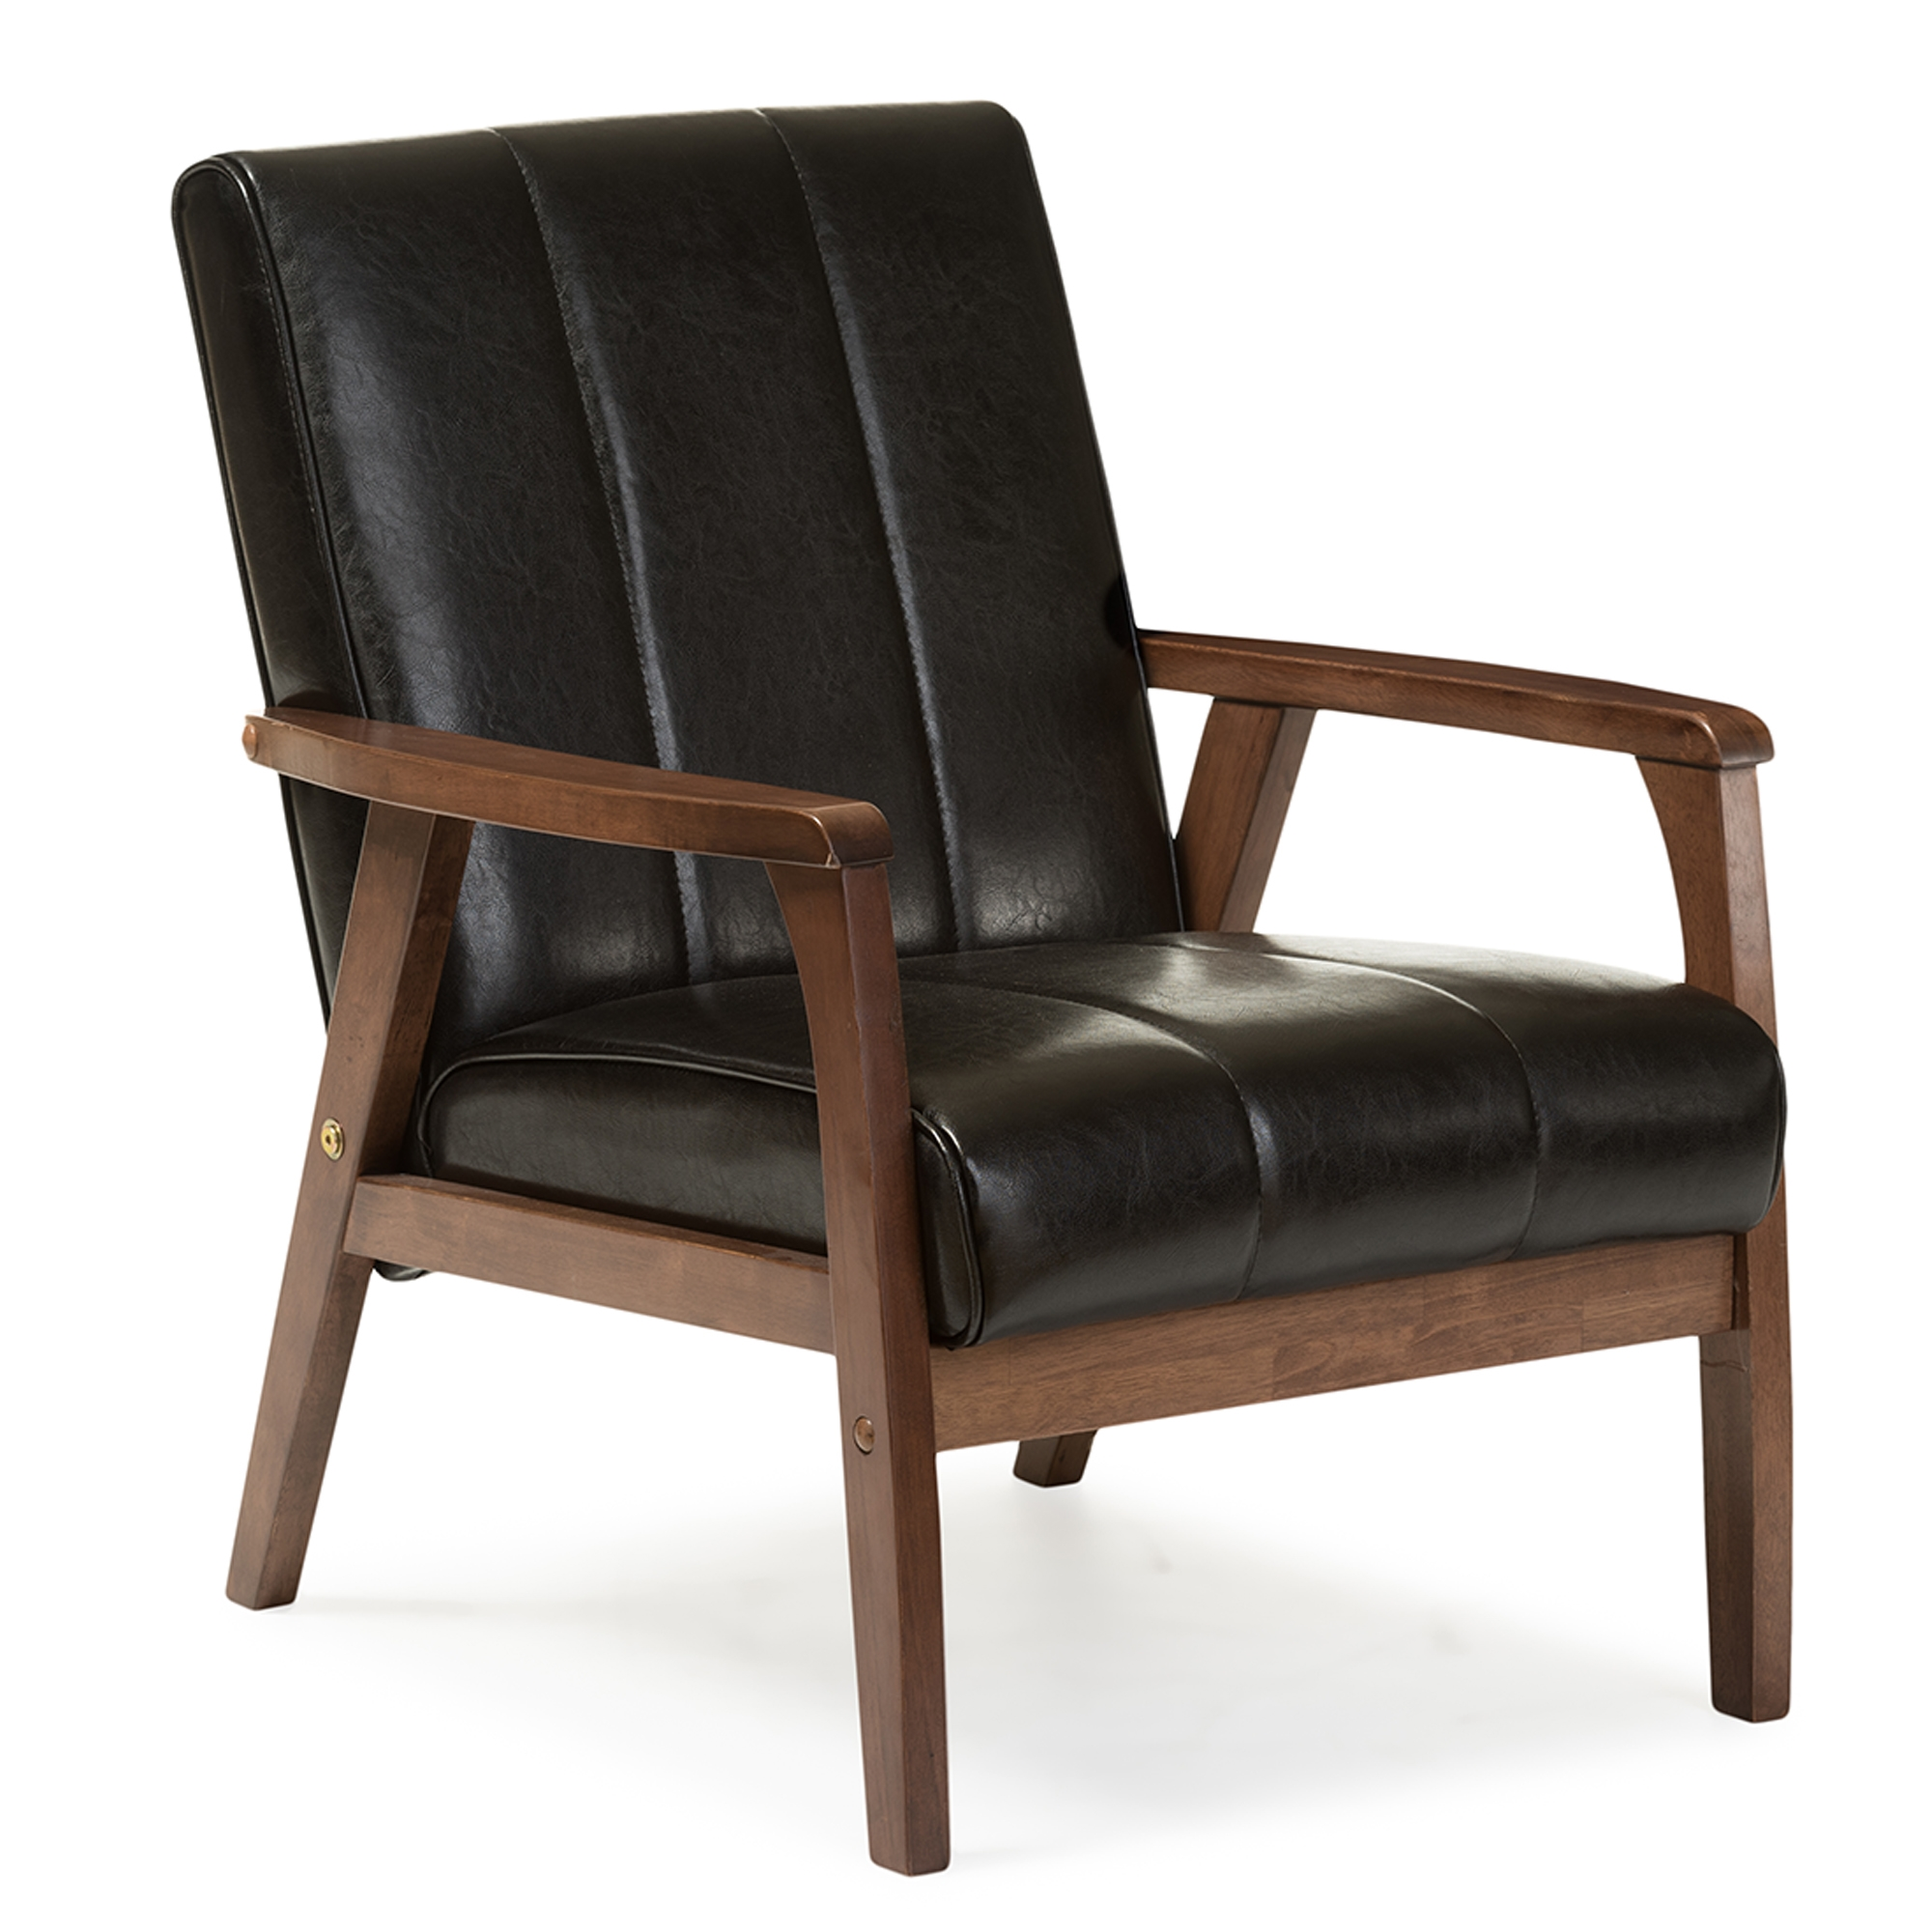 Baxton Studio Nikko Mid century Modern Scandinavian Style  : BBT8011A2 Black Chair 2 from www.baxtonstudiooutlet.com size 1000 x 1000 jpeg 318kB